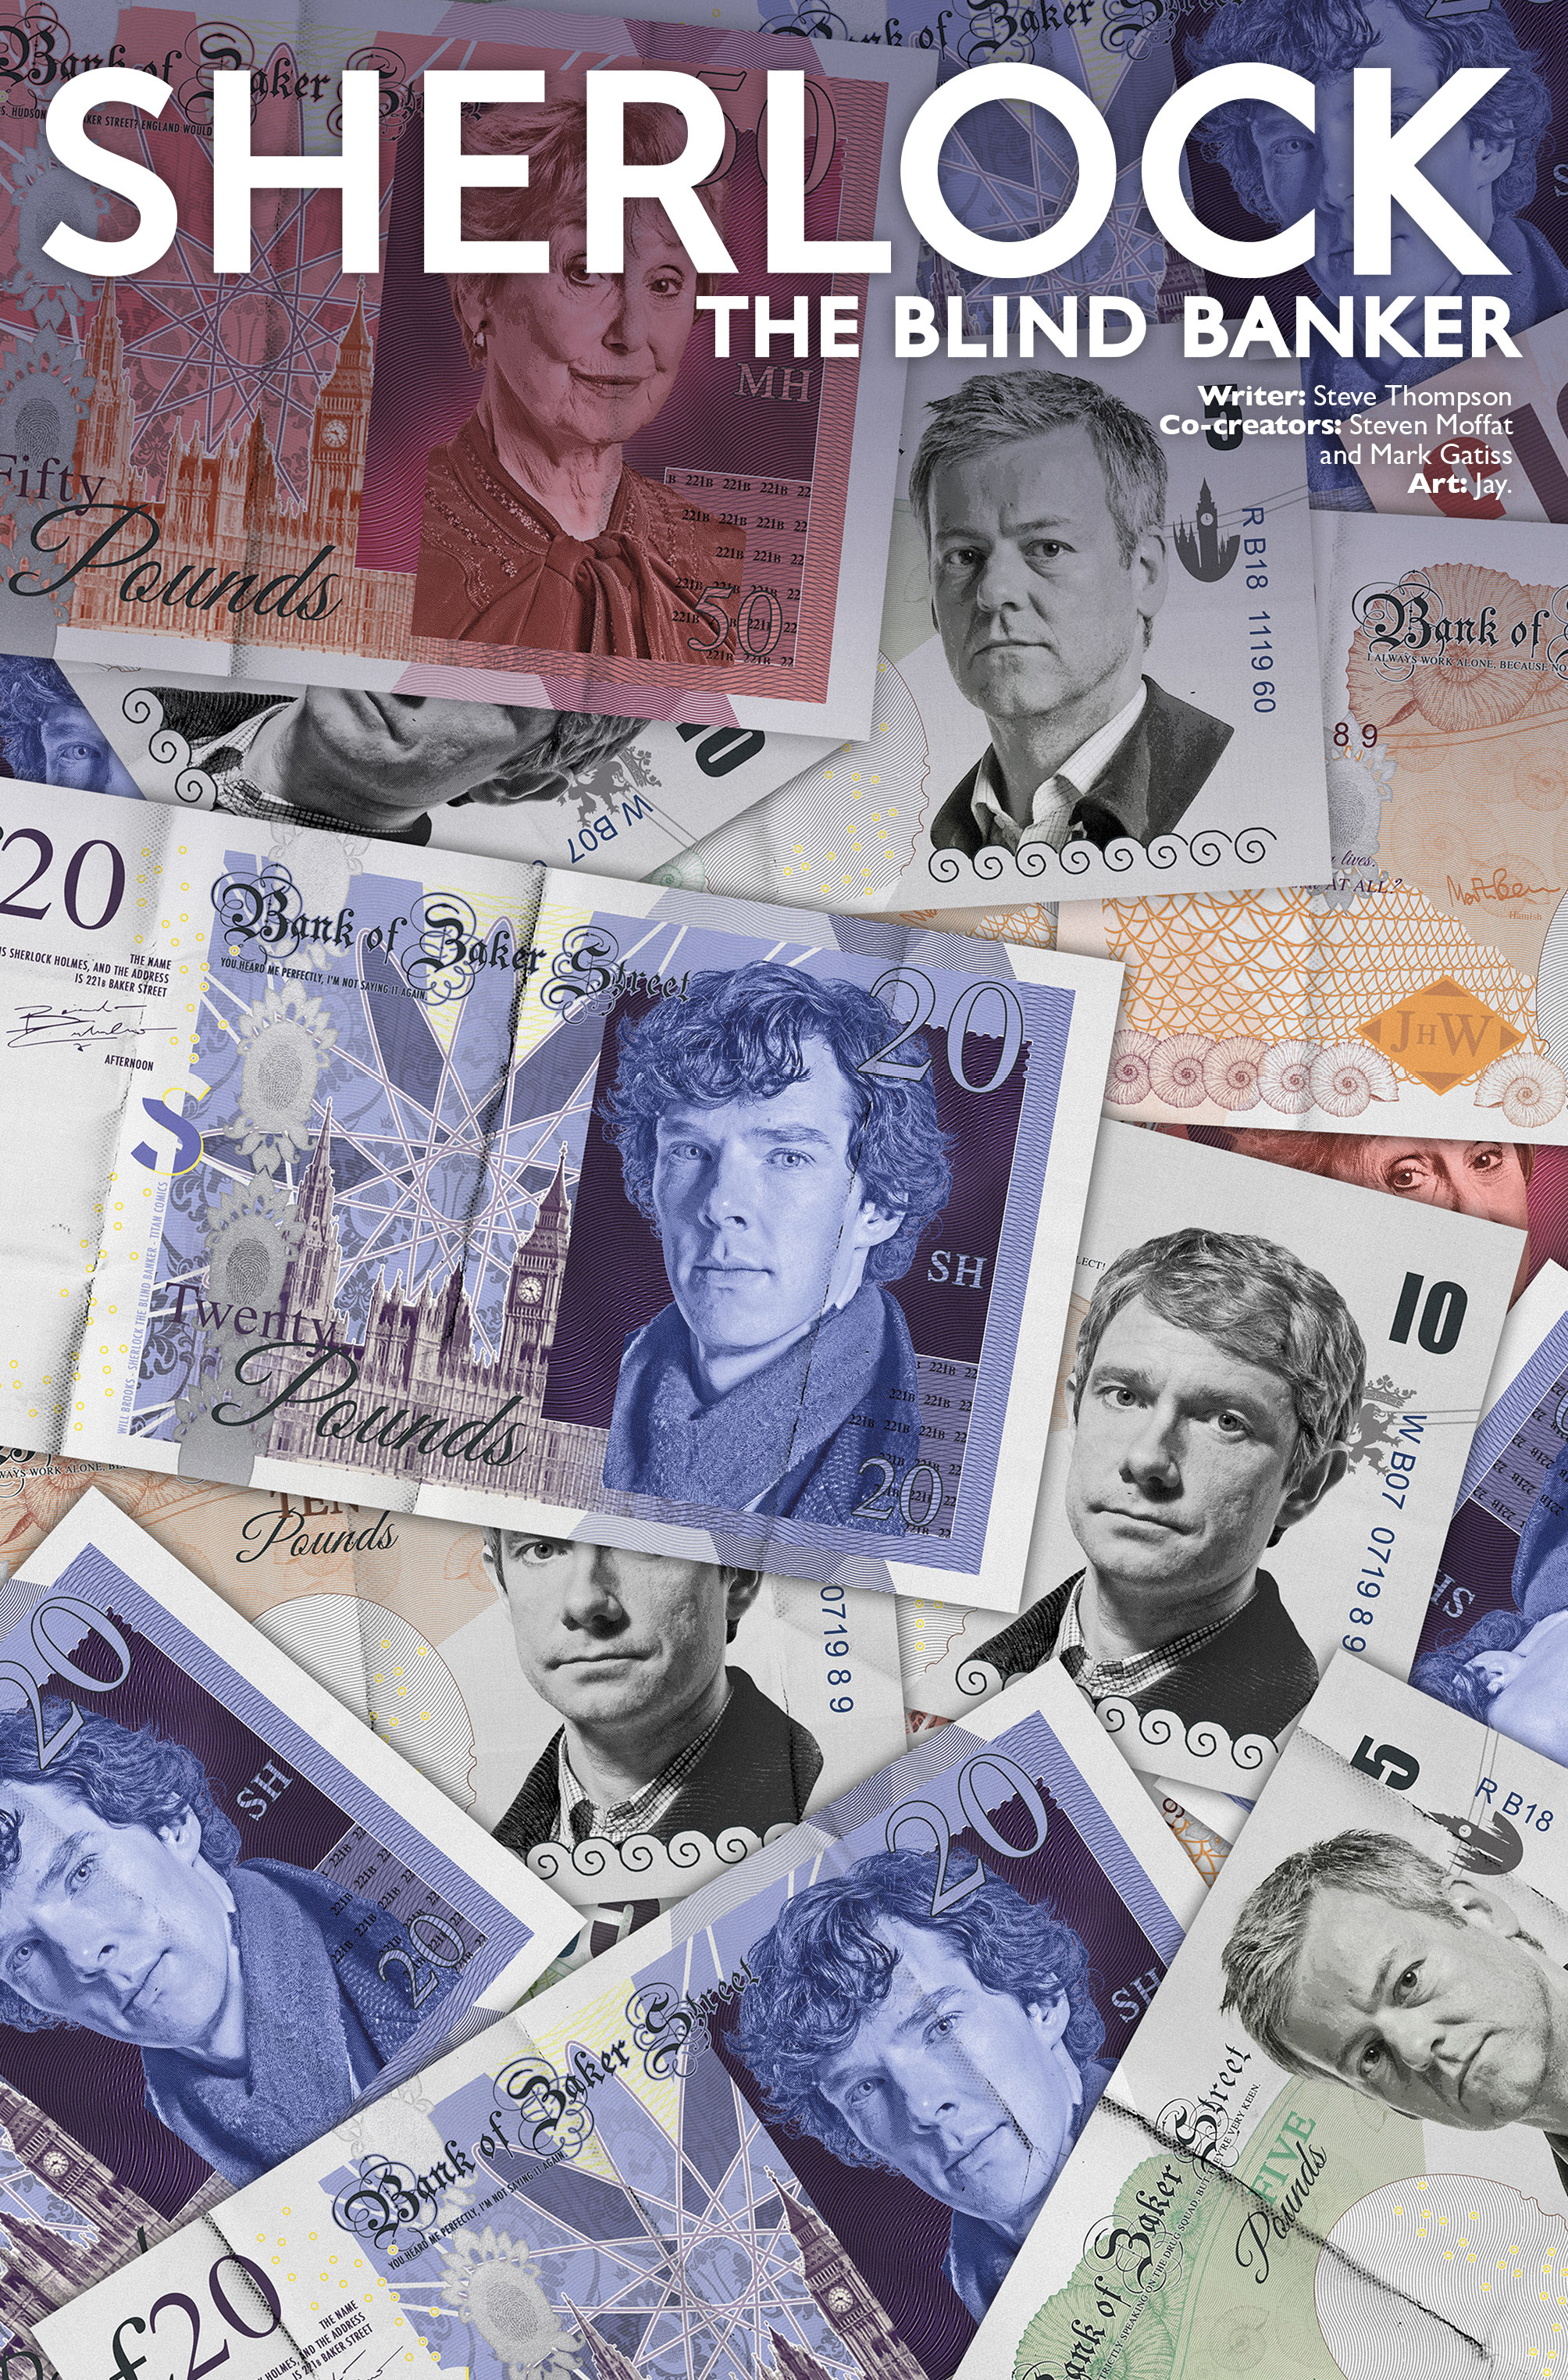 Read online Sherlock: The Blind Banker comic -  Issue #2 - 2